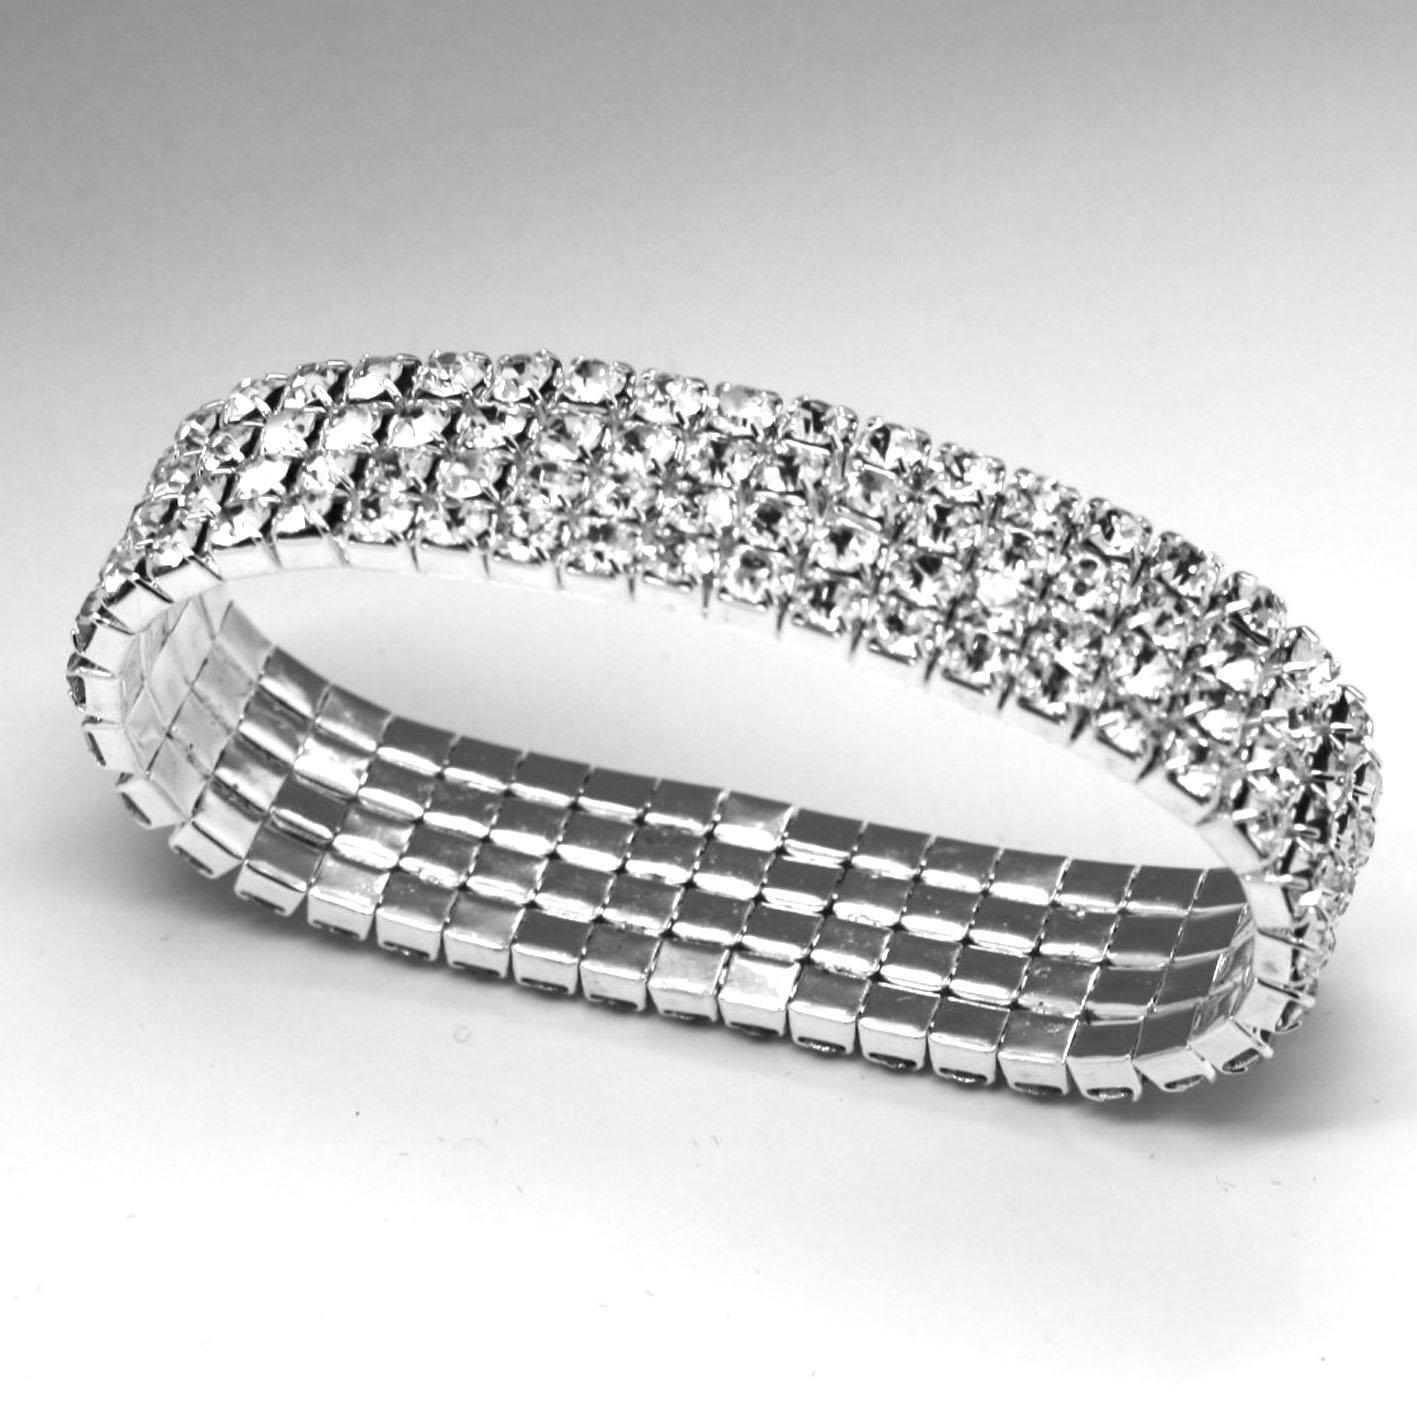 fi9® 3, 4, 5 Row Stretchy Stretch Diamante Silver Stretchy Anklet Ankle chain (3 ROW) MOD